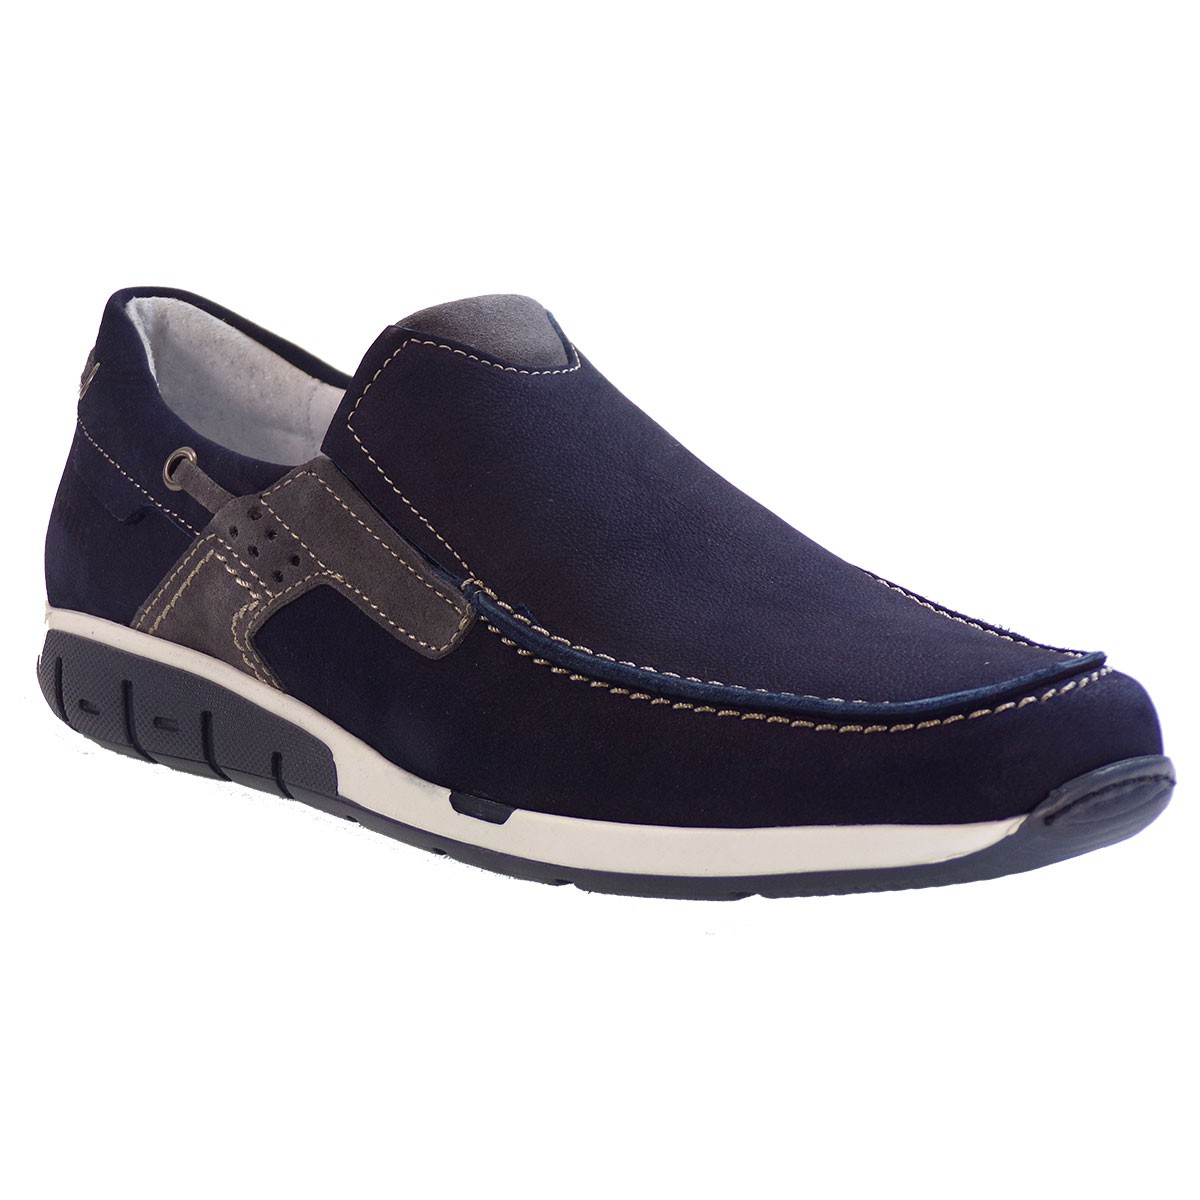 cda6a185a8d Softies Ανδρικά Παπούτσια 6966 Μπλέ Δέρμα Καστόρι  Γυναικεία ...